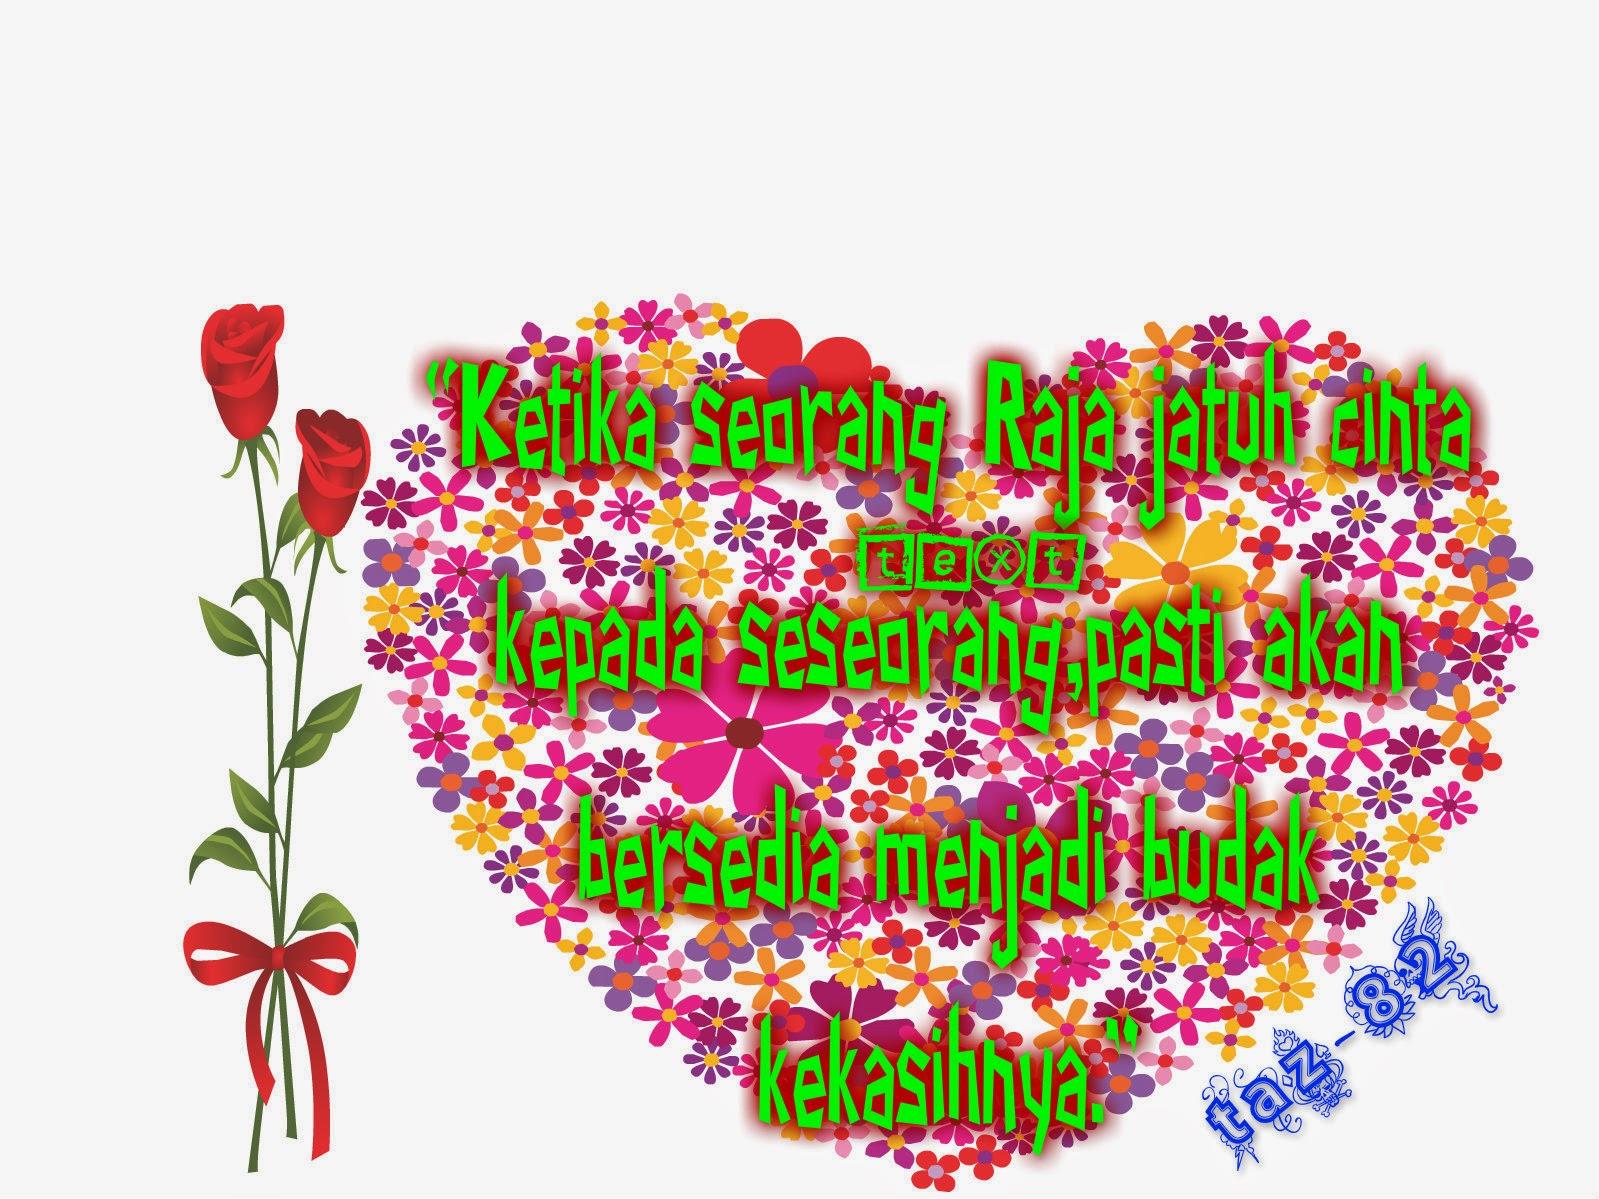 BBM BERGAMBAR Gambar Kata Kata Cinta Romantis Indah